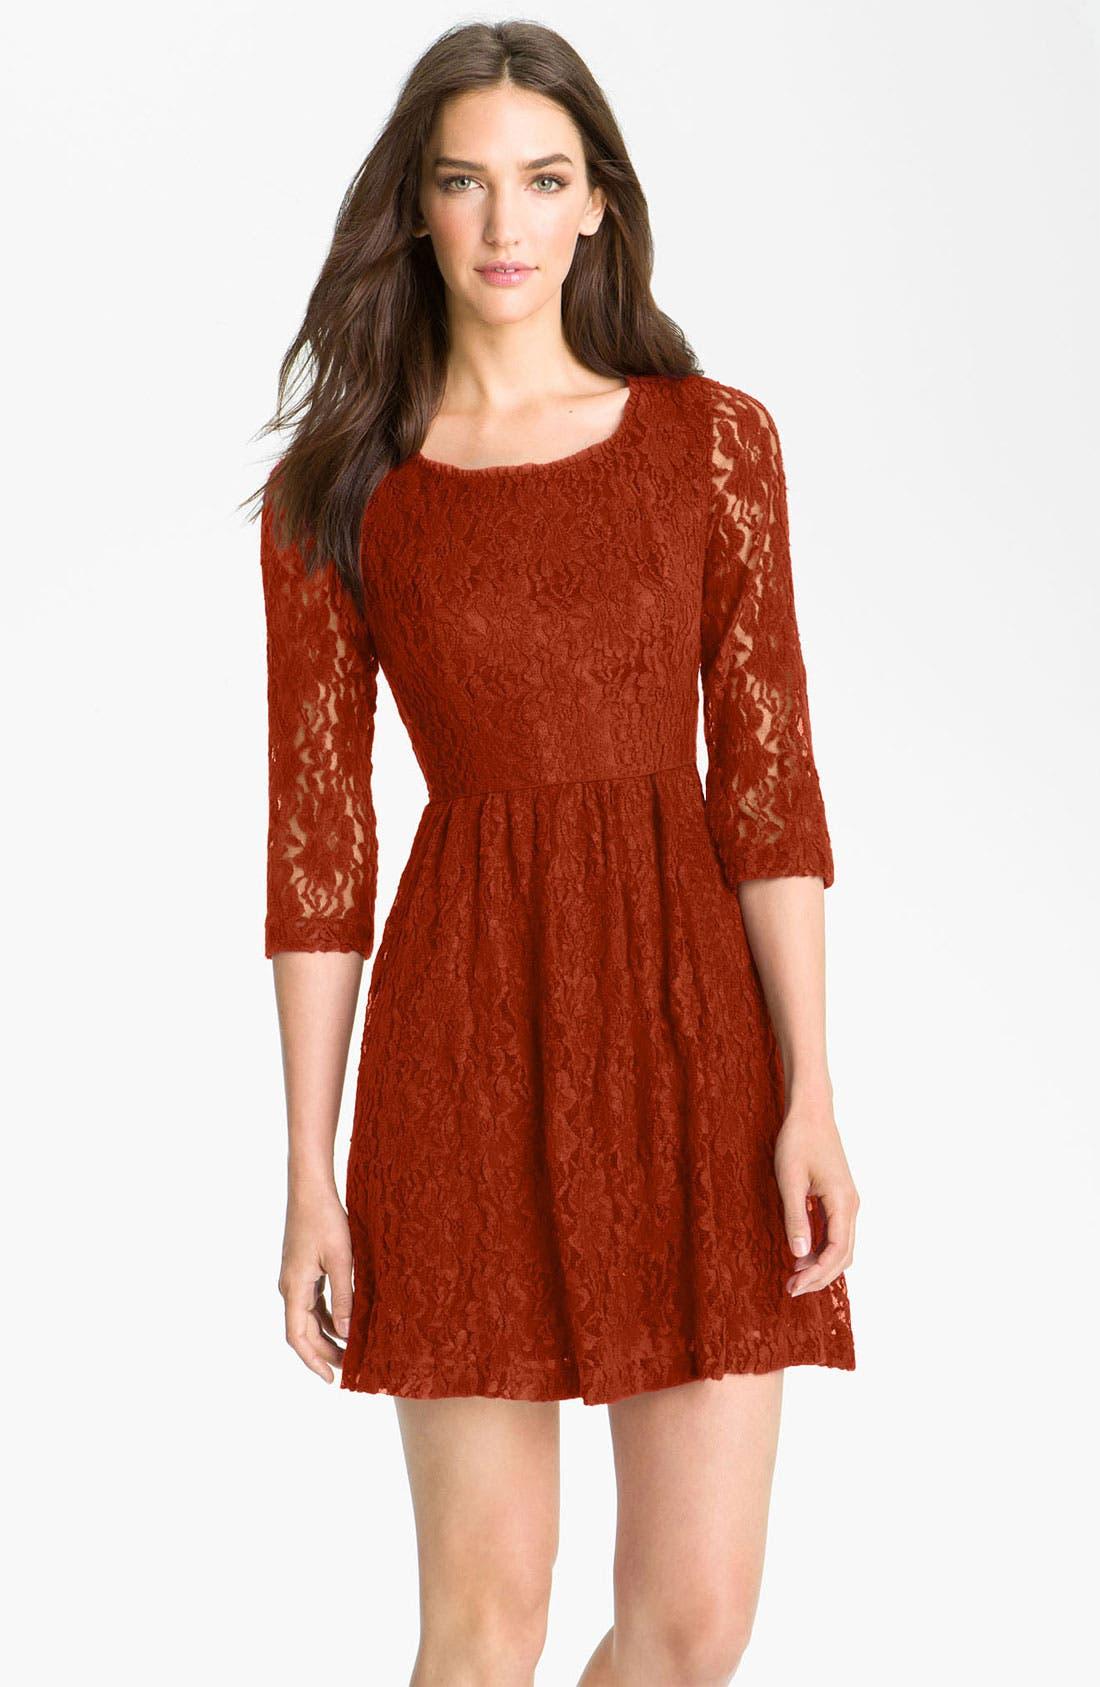 Alternate Image 1 Selected - Kensie Lace Dress